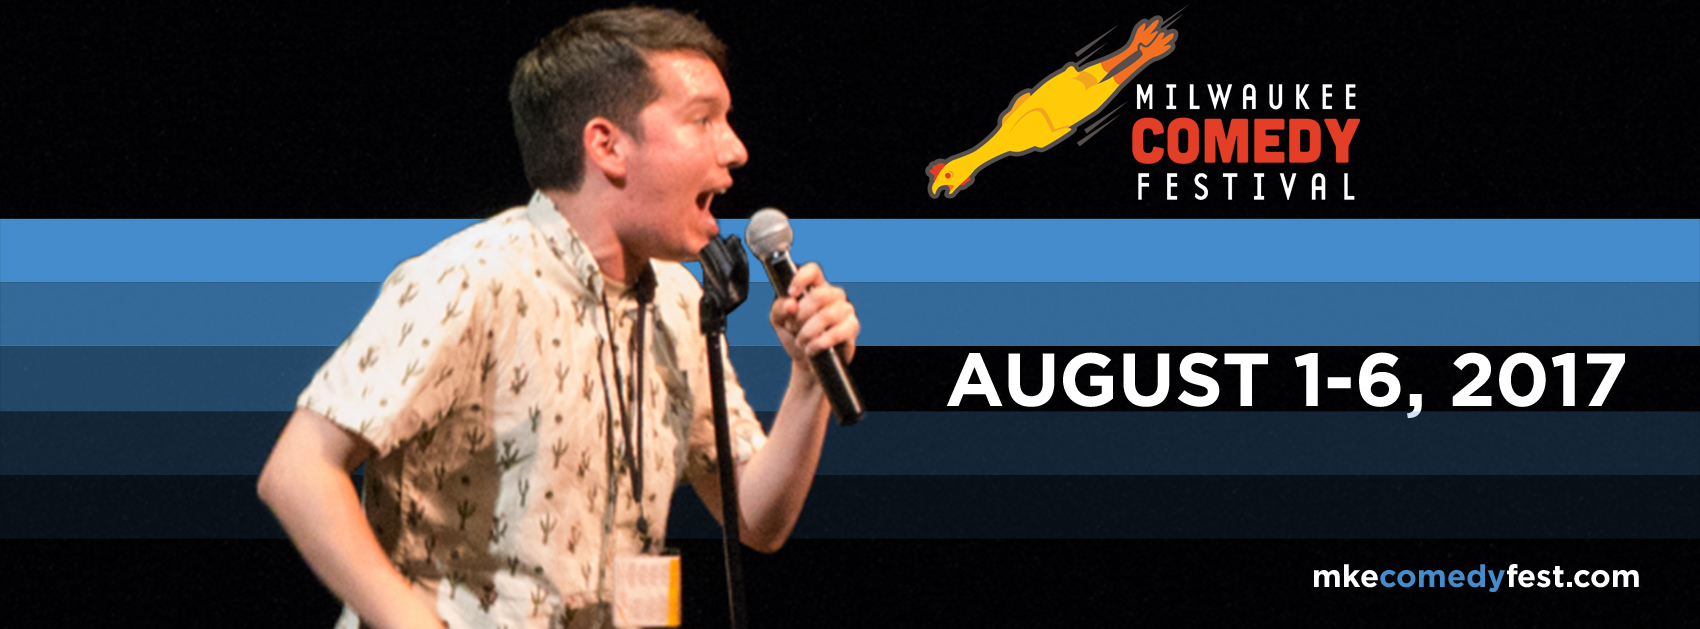 MKE Comedy Fest